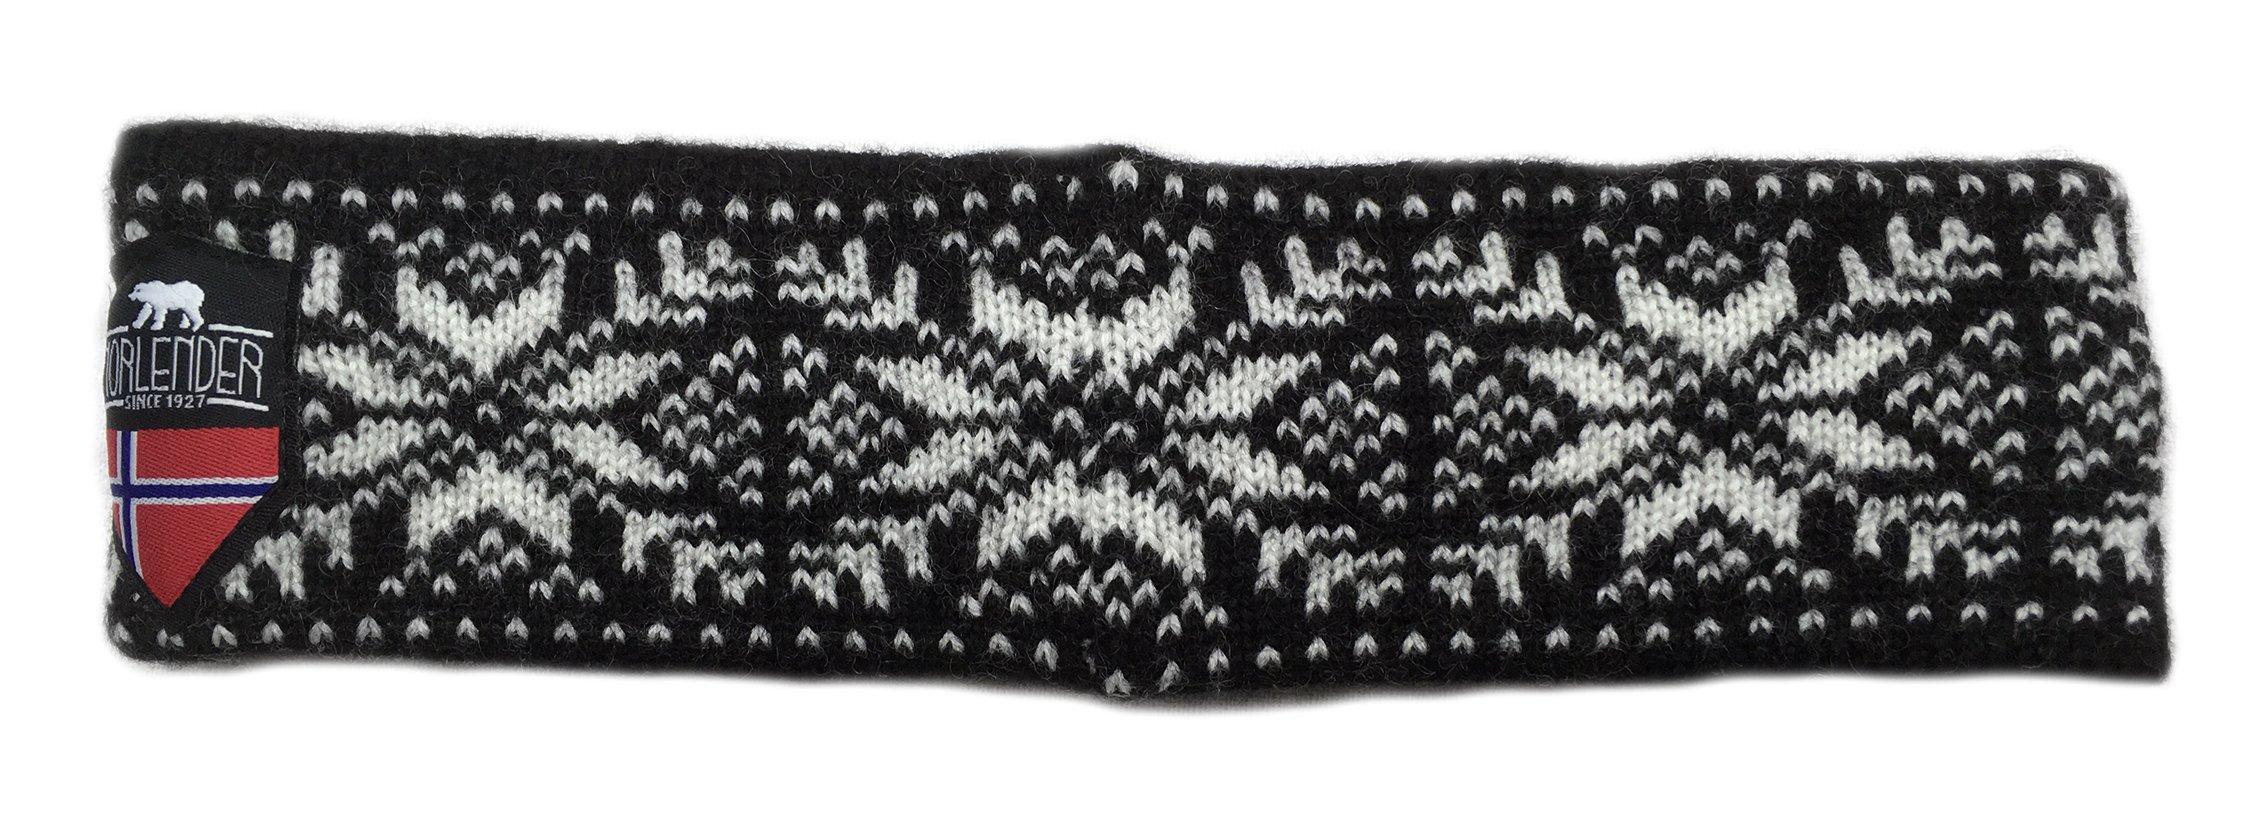 Norlender 100% Norwegian Wool Dot Print Headband (Black) by Norlender